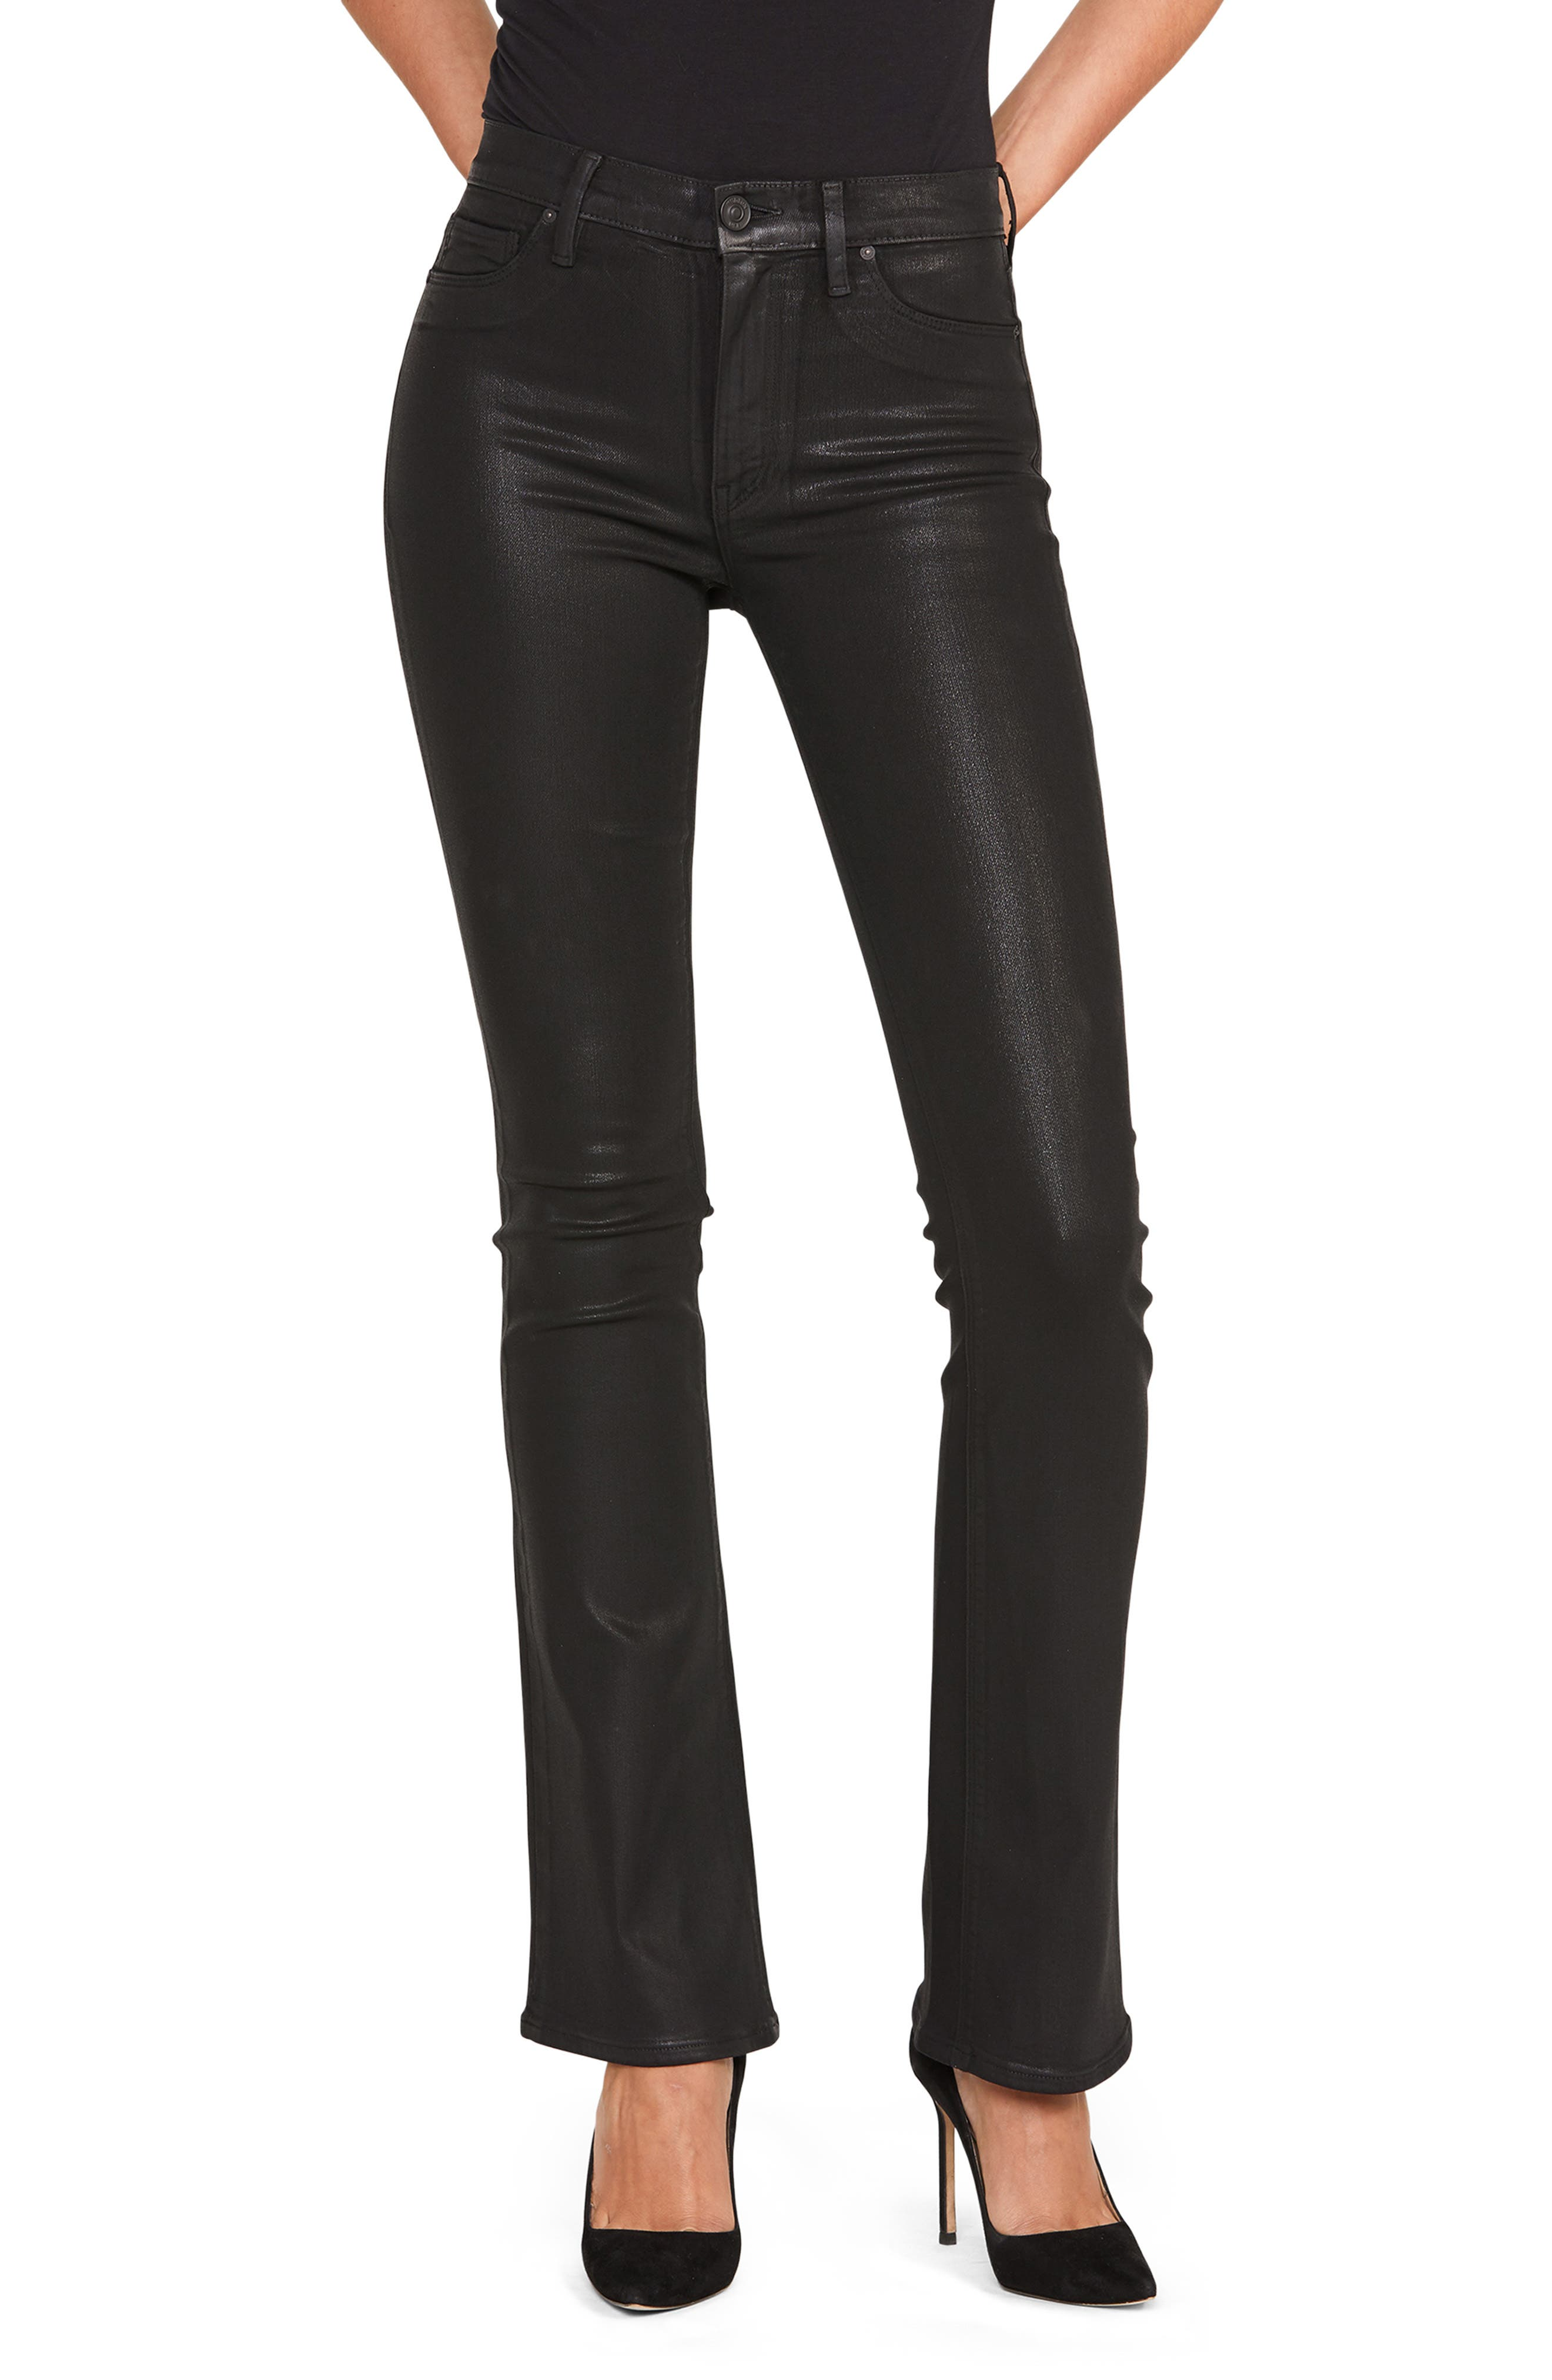 Women's Hudson Jeans Barbara Coated High Waist Bootcut Jeans